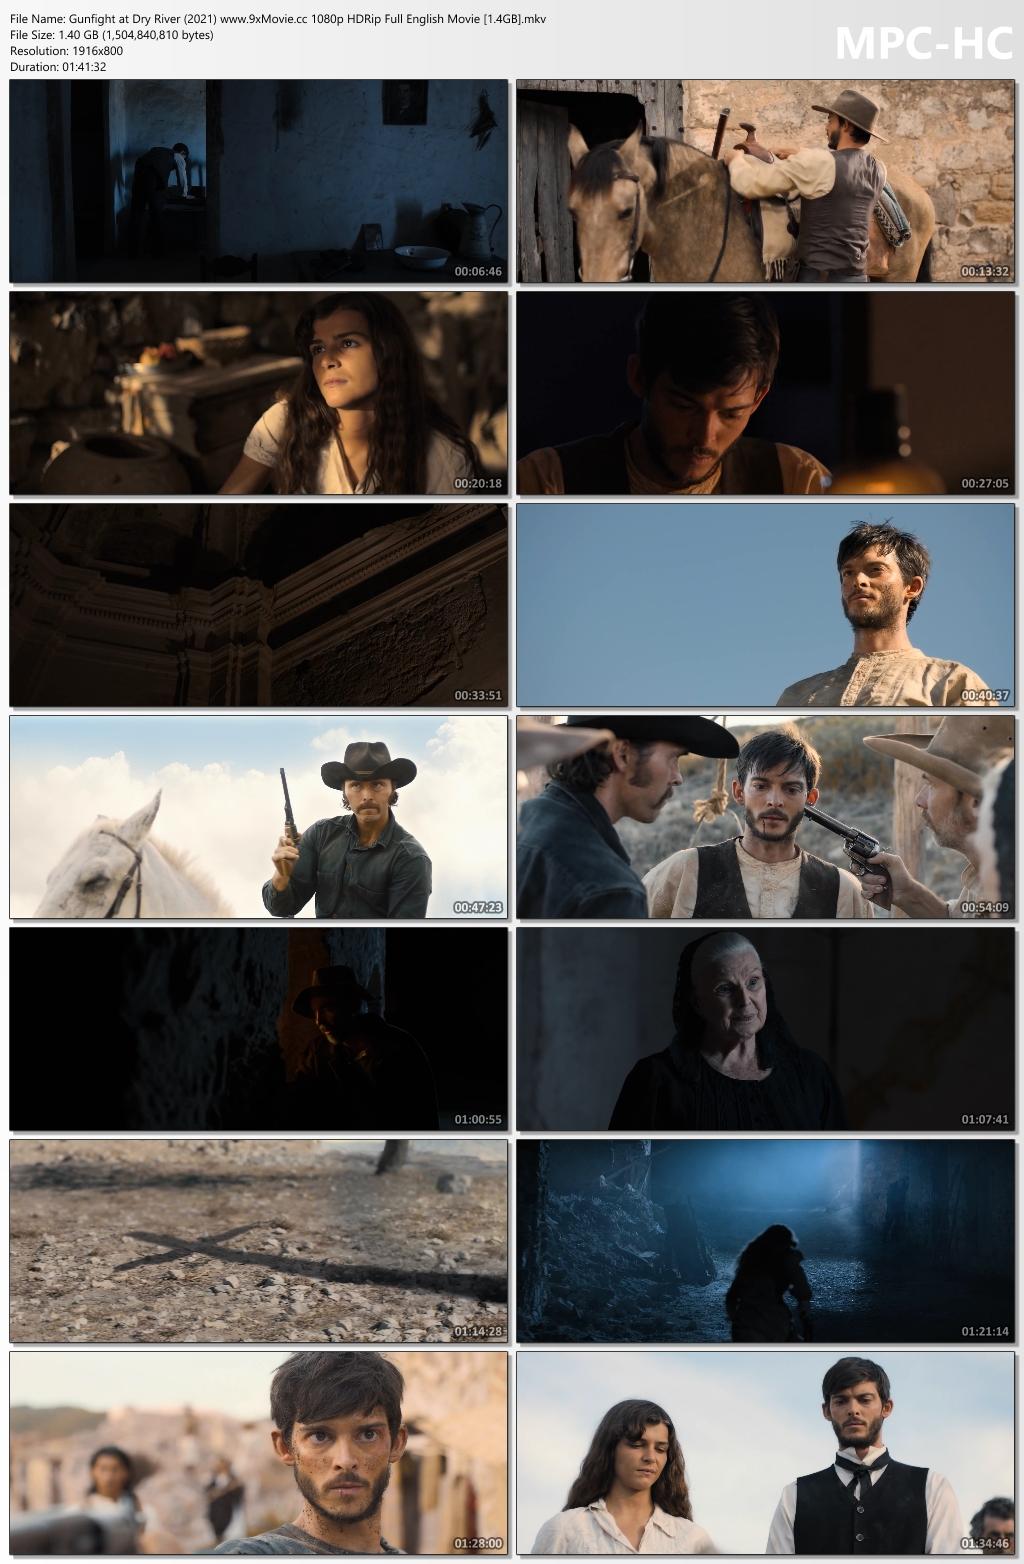 Gunfight-at-Dry-River-2021-www-9x-Movie-cc-1080p-HDRip-Full-English-Movie-1-4-GB-mkv